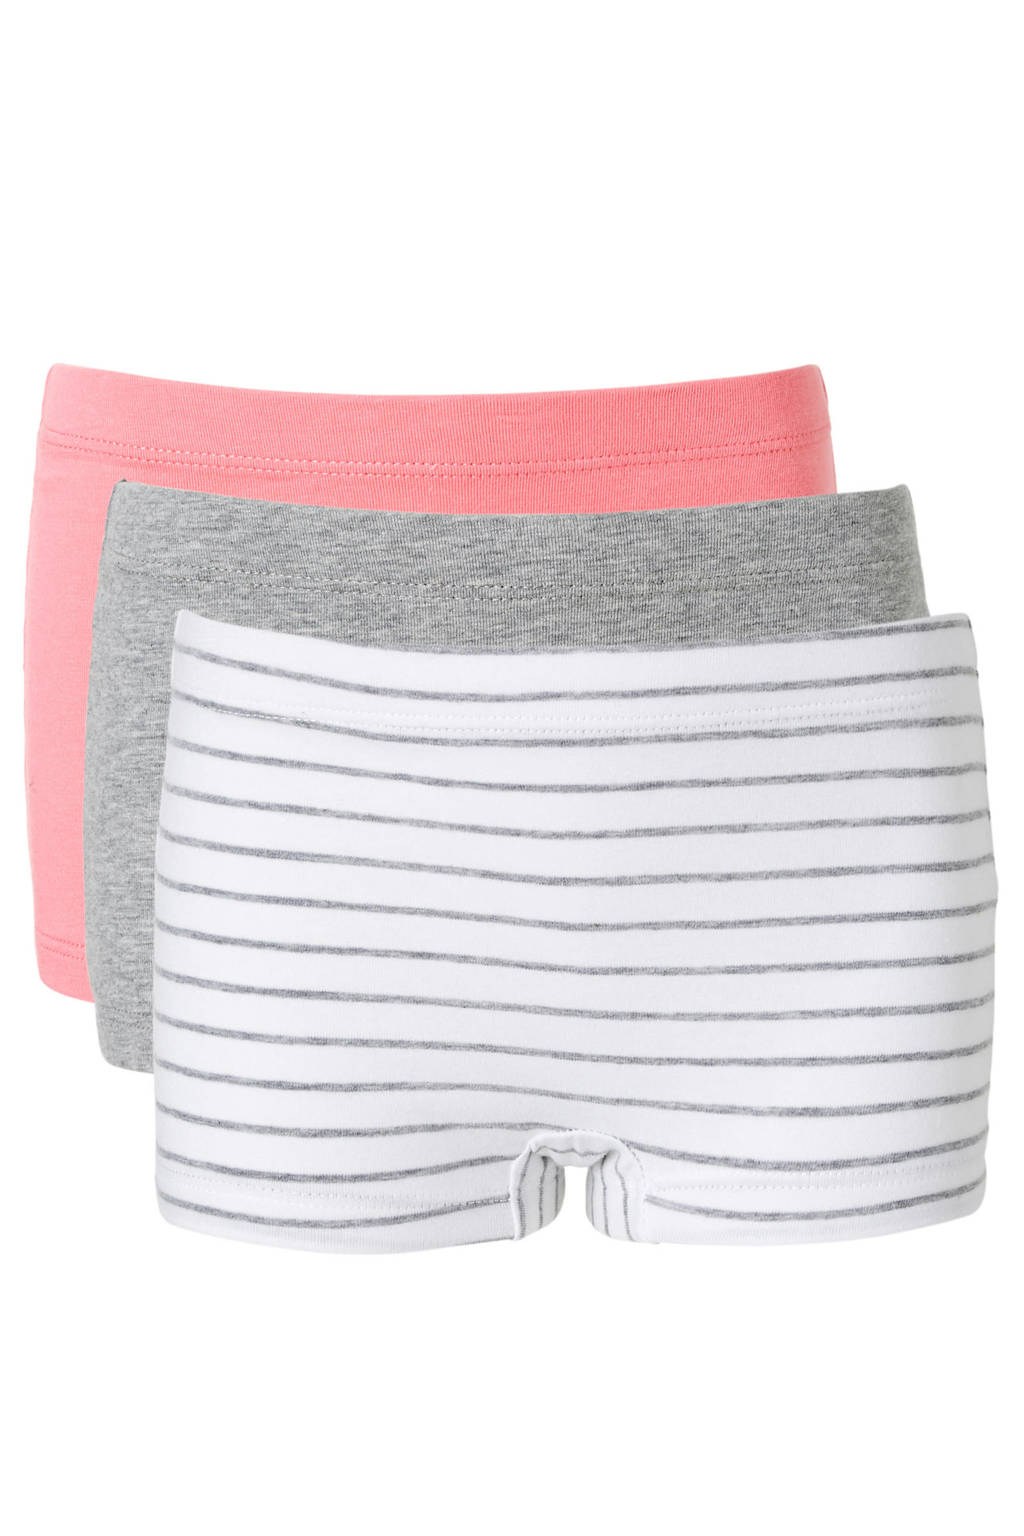 name it MINI short - set van 3, wit/grijs/roze